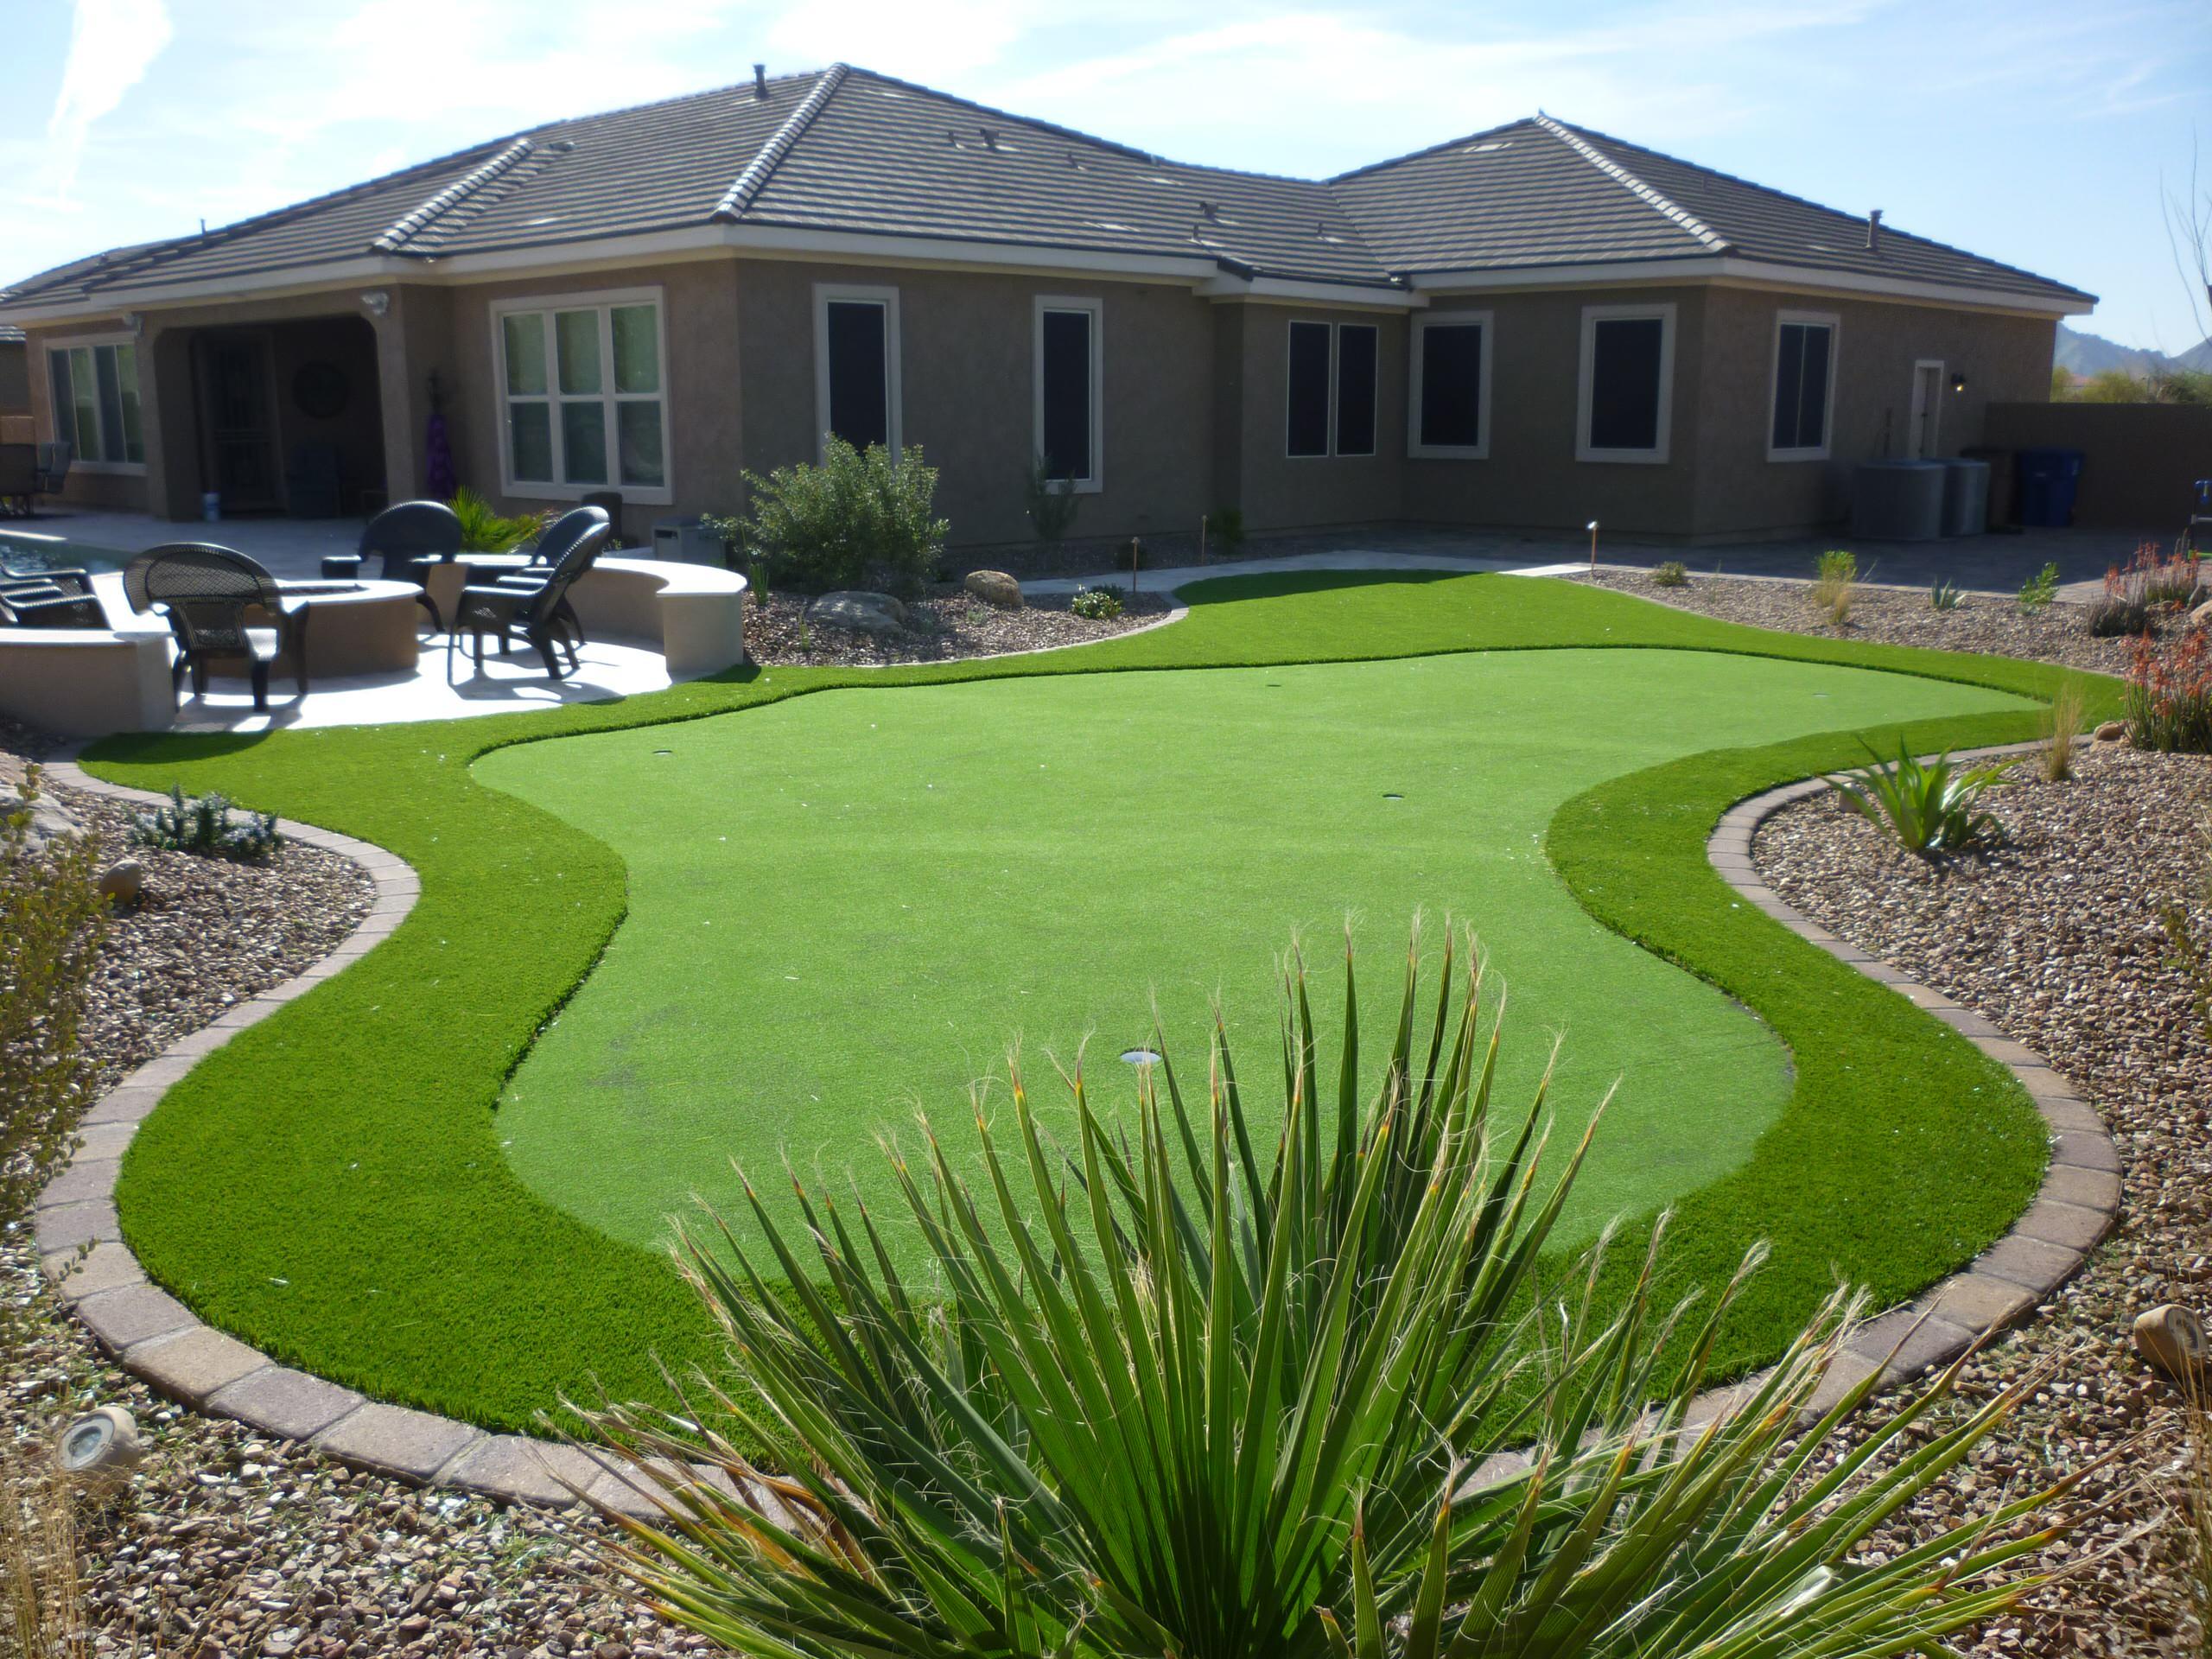 Artificial Turf & Putting Green